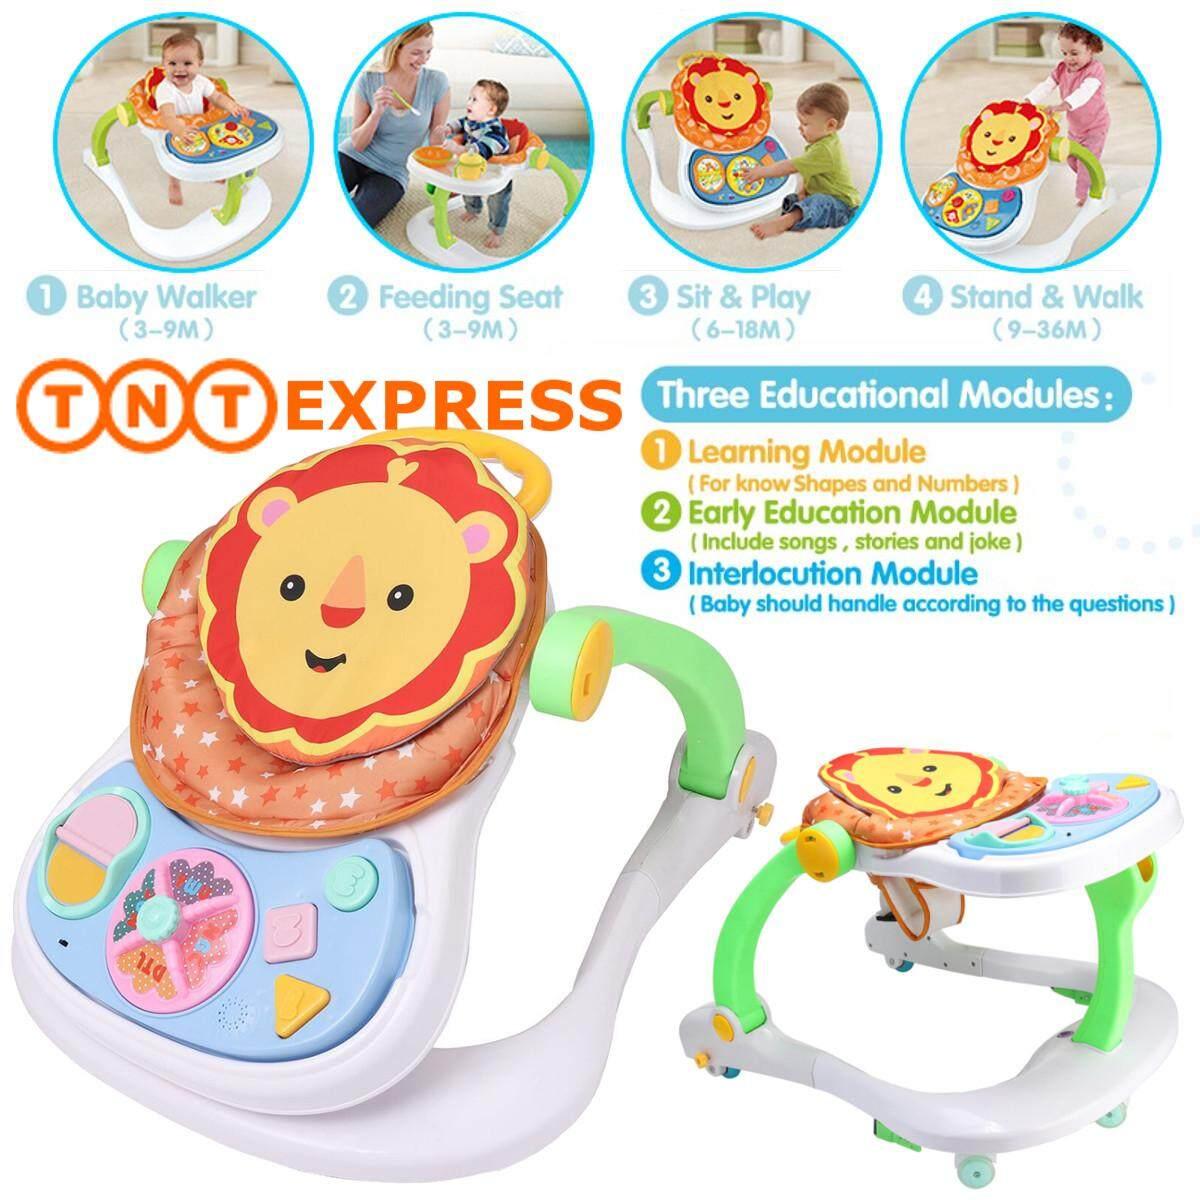 4 in 1 Multi Functional Entertainer Baby Walker Toddler Kids Educational Walk Tool Gifts